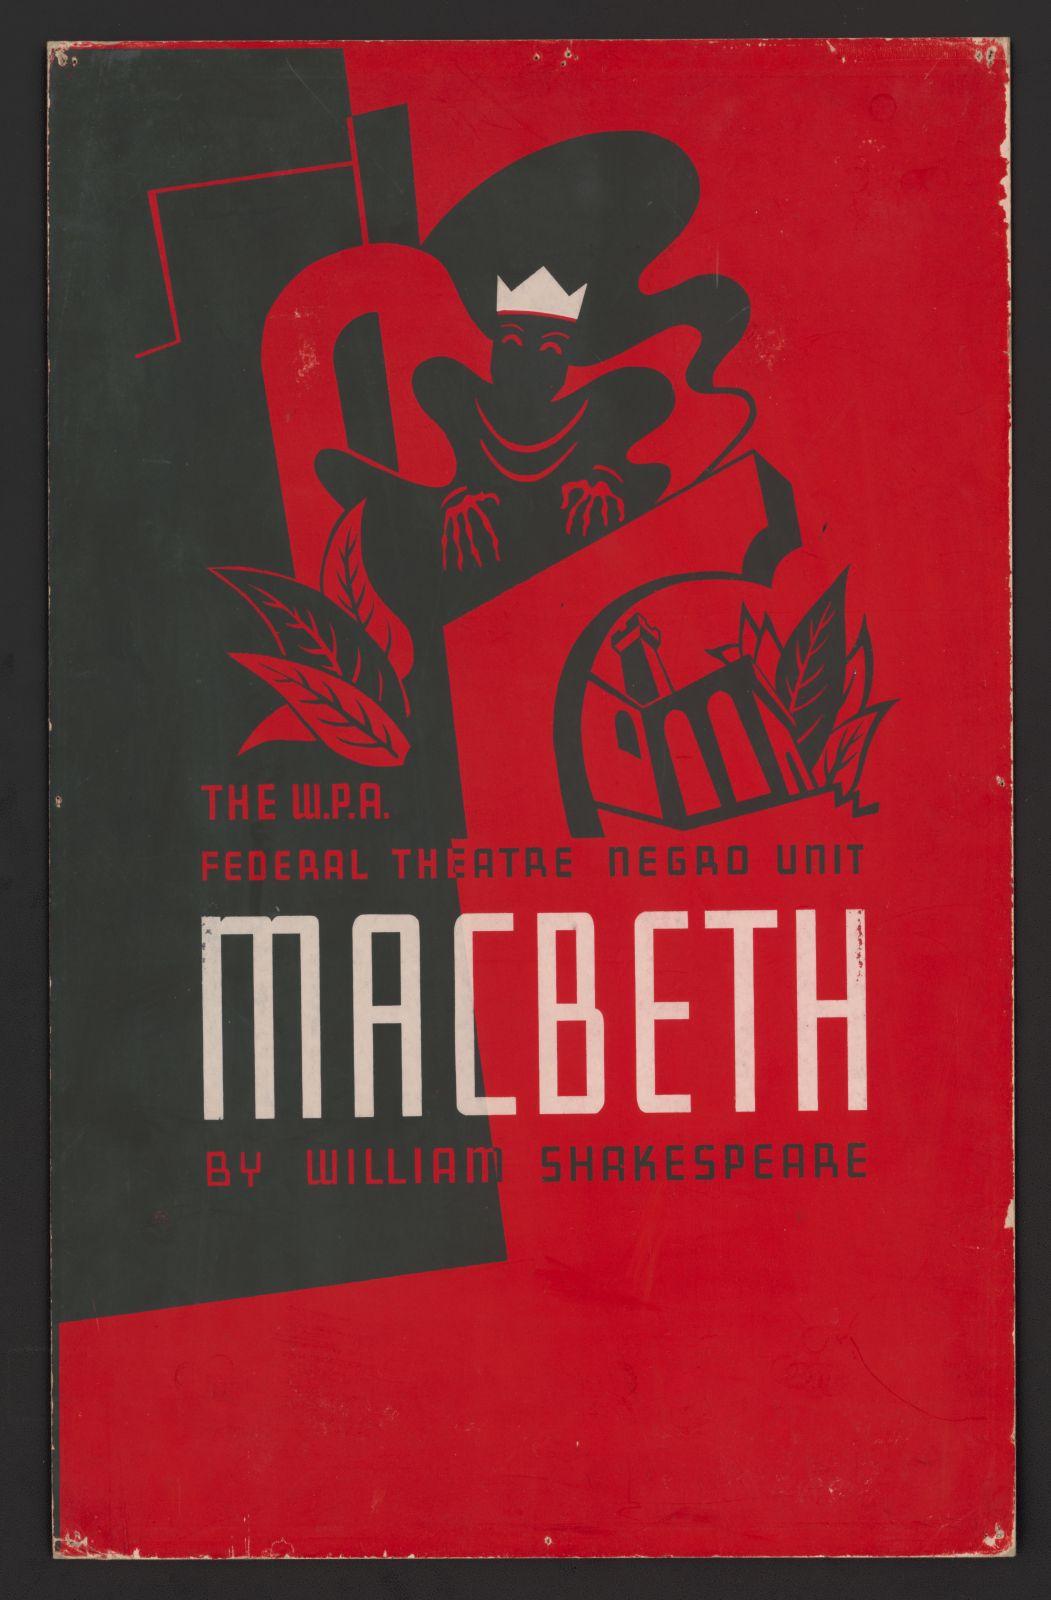 The W.P.A. Federal Theatre Negro Unit [presents] Macbeth by William Shakespeare